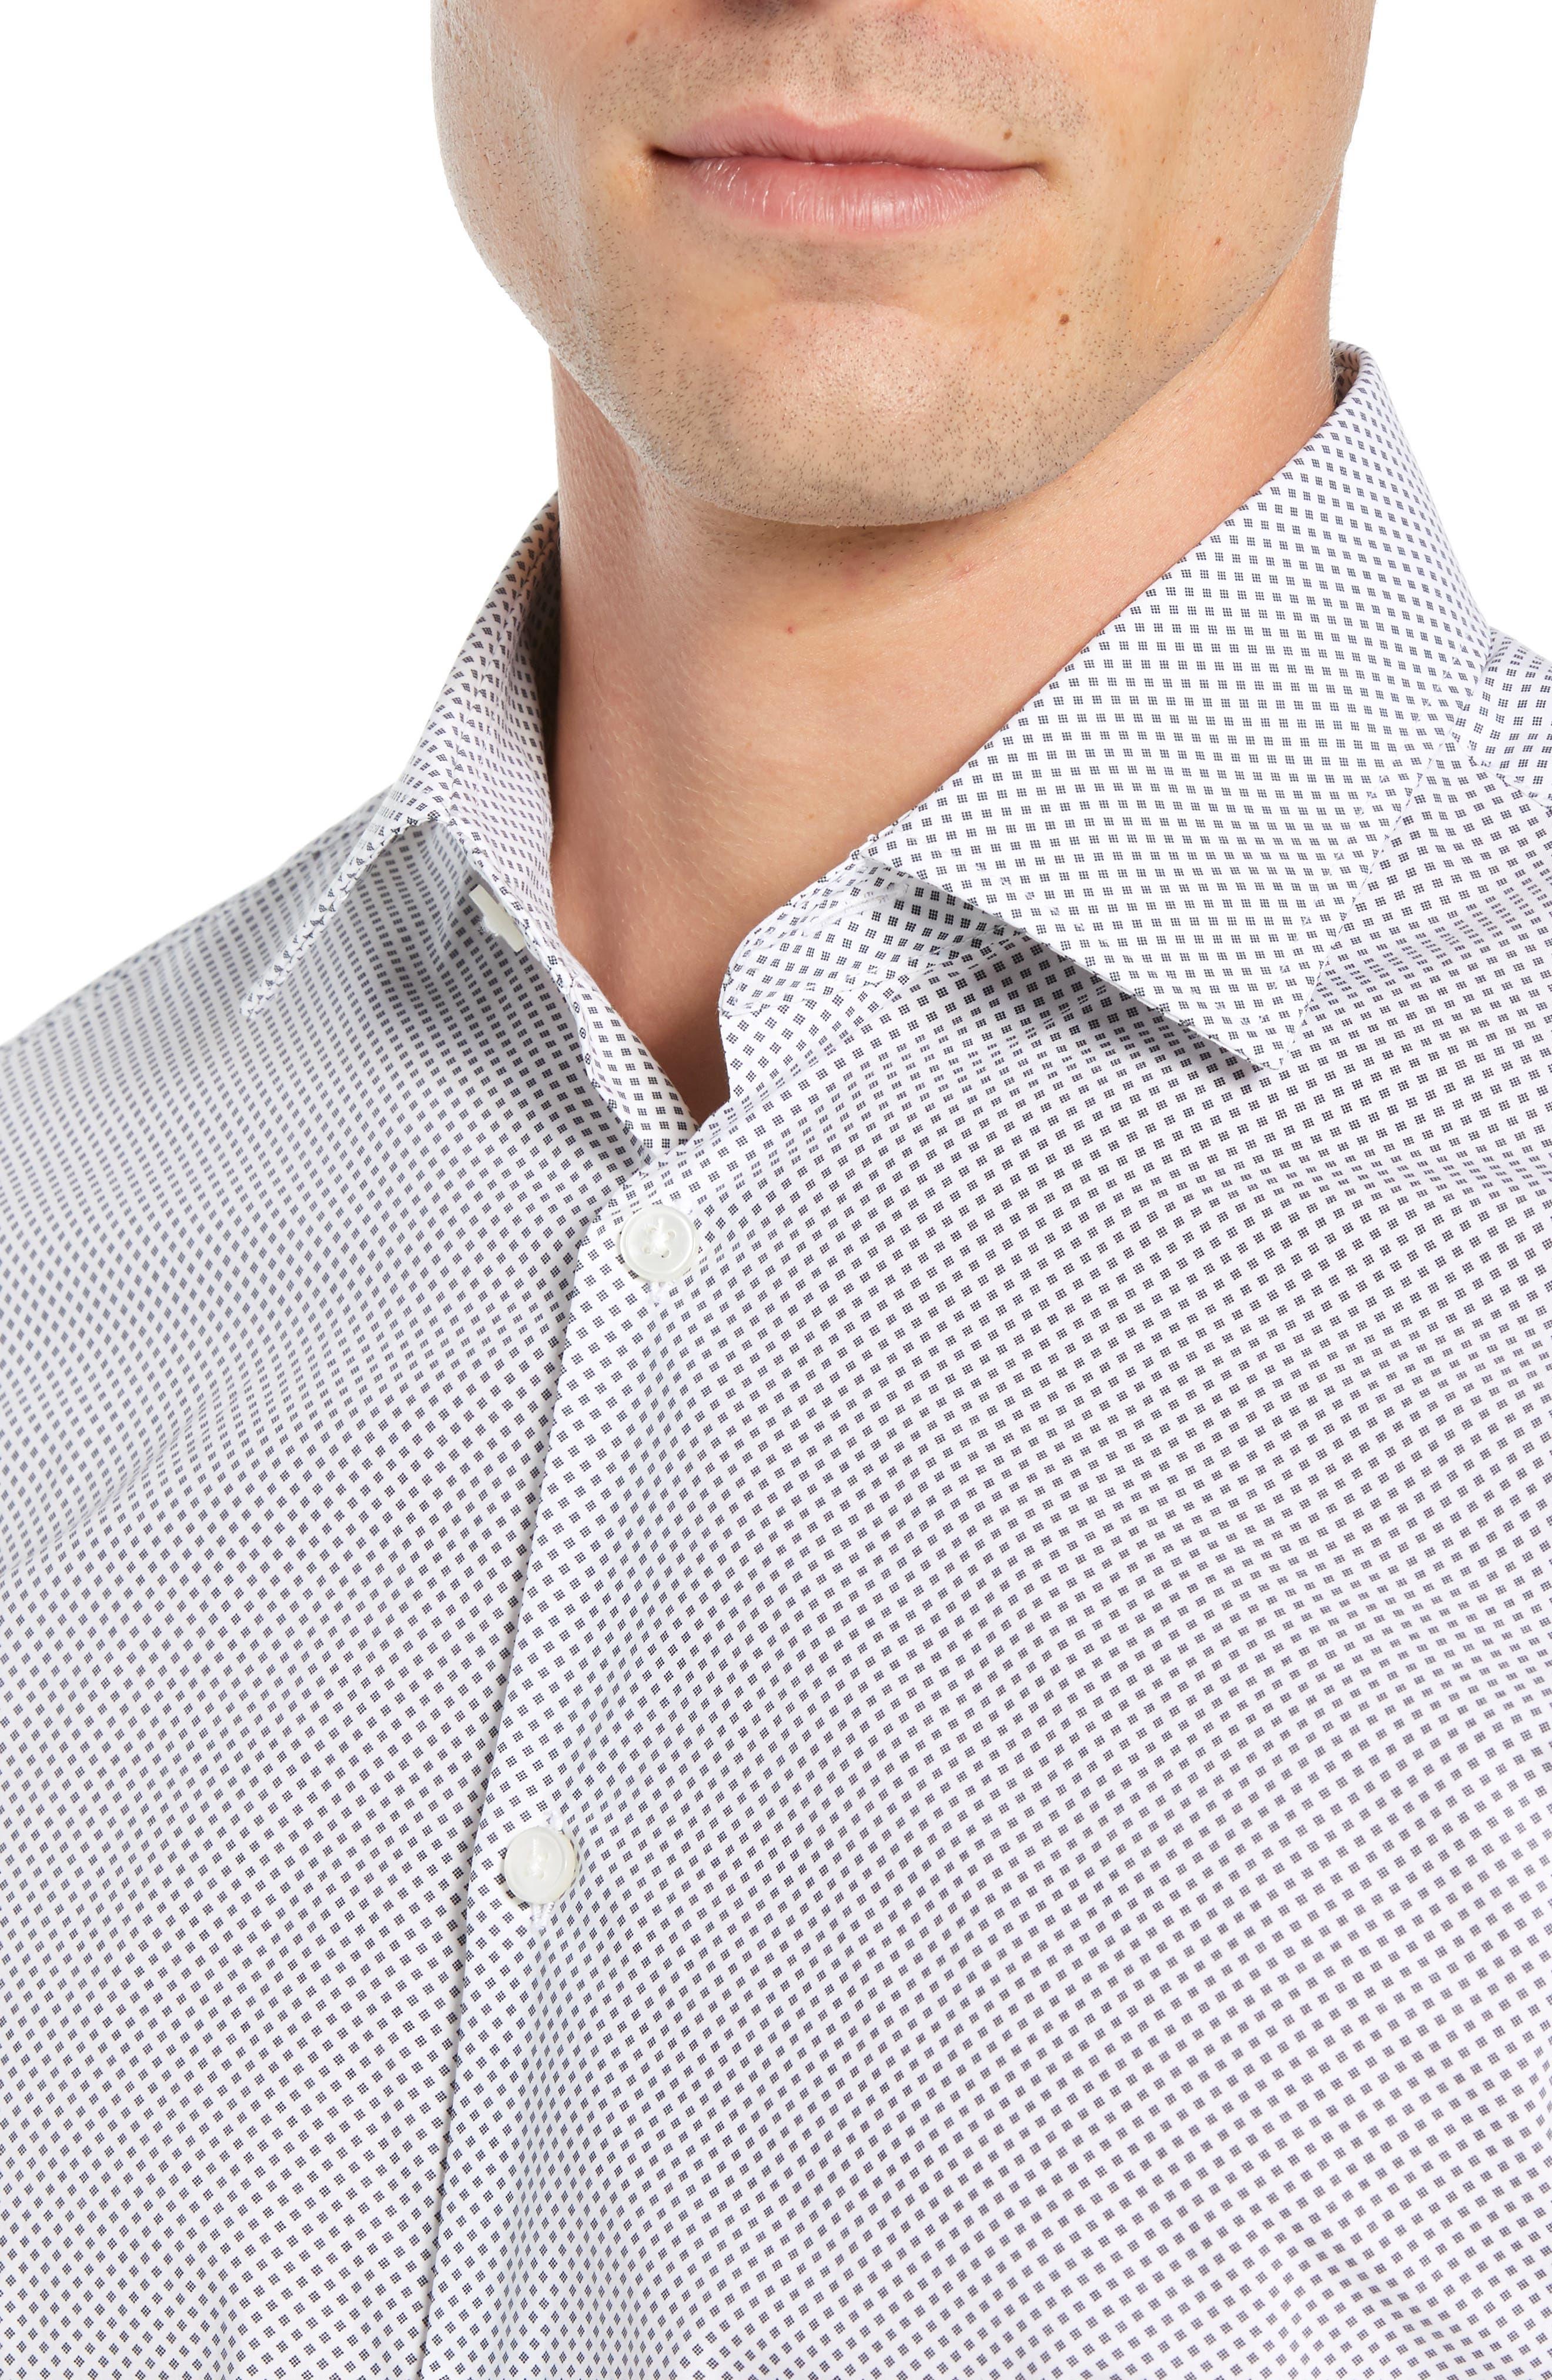 Regular Fit Geometric Dress Shirt,                             Alternate thumbnail 2, color,                             THUNDER GREY